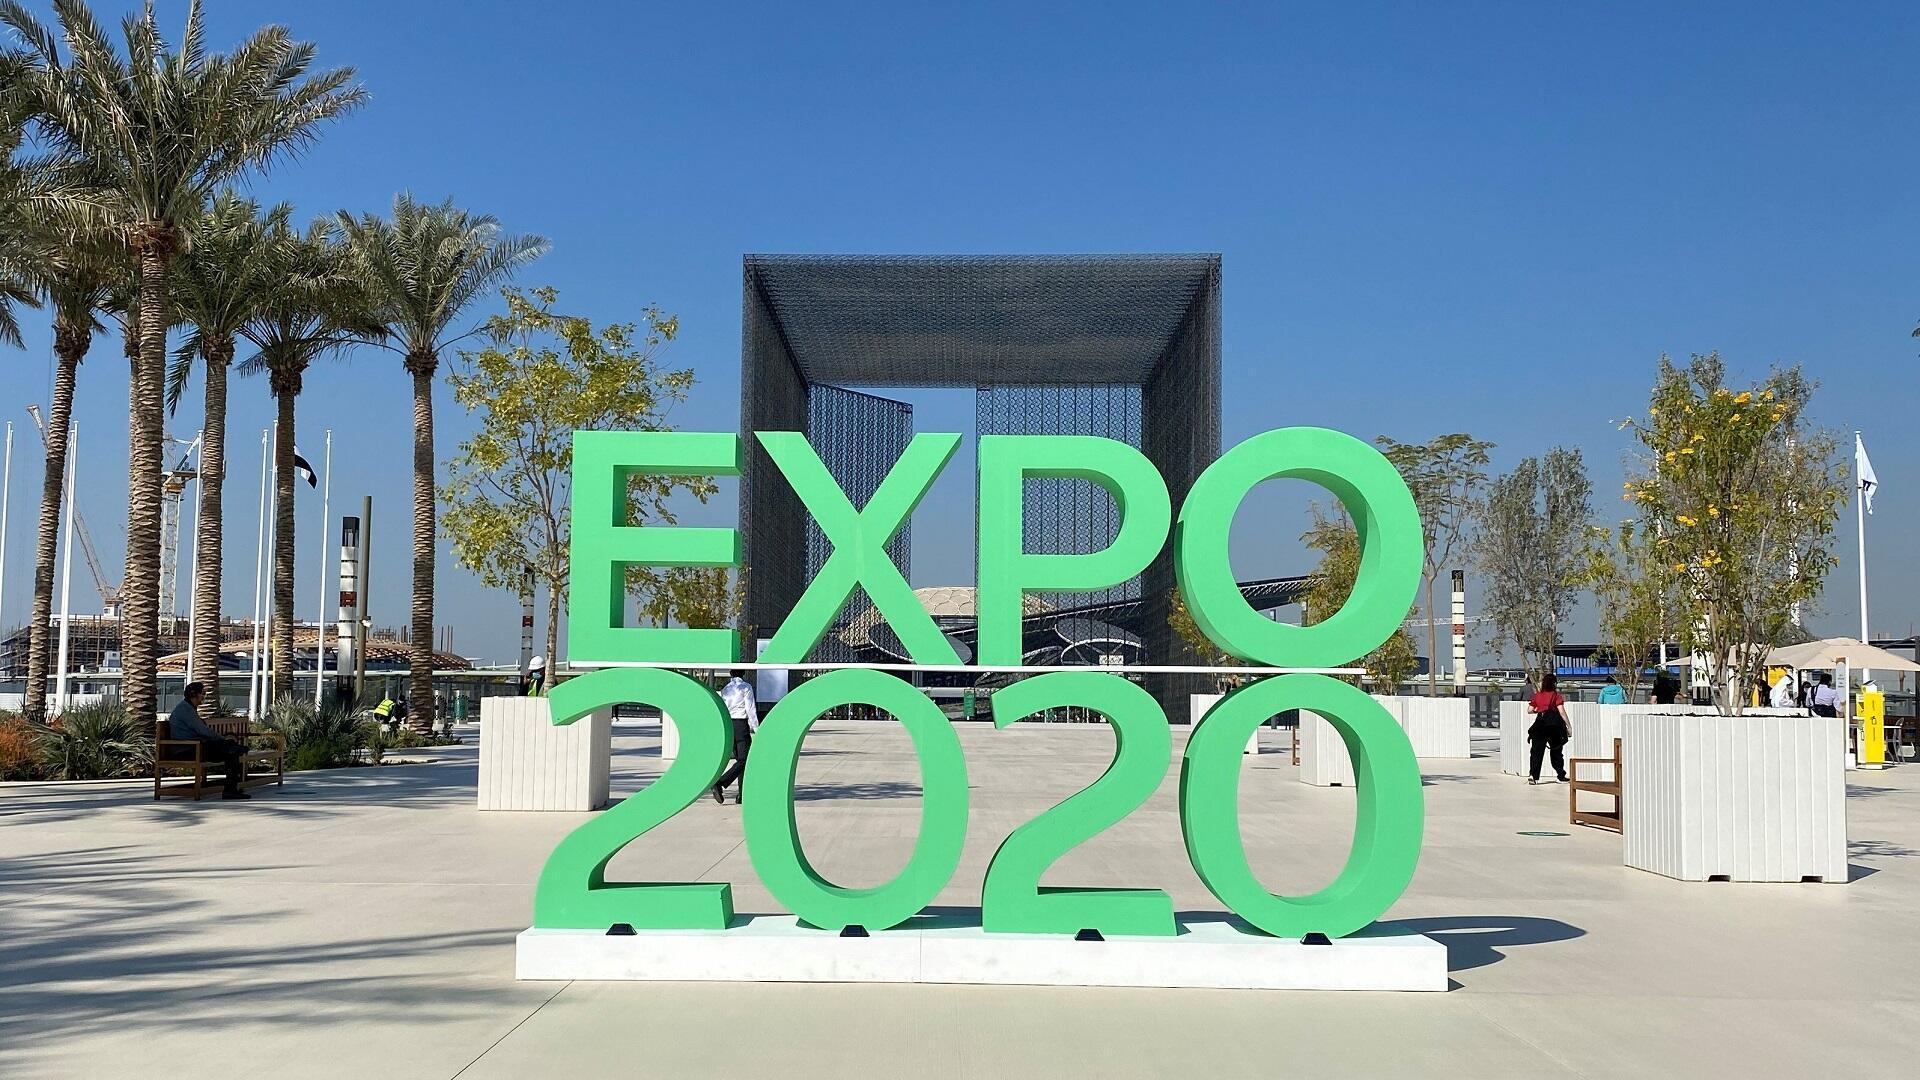 2021-09-15T134429Z_908894430_RC2DQP9KXJZ3_RTRMADP_3_EMIRATES-EXPO